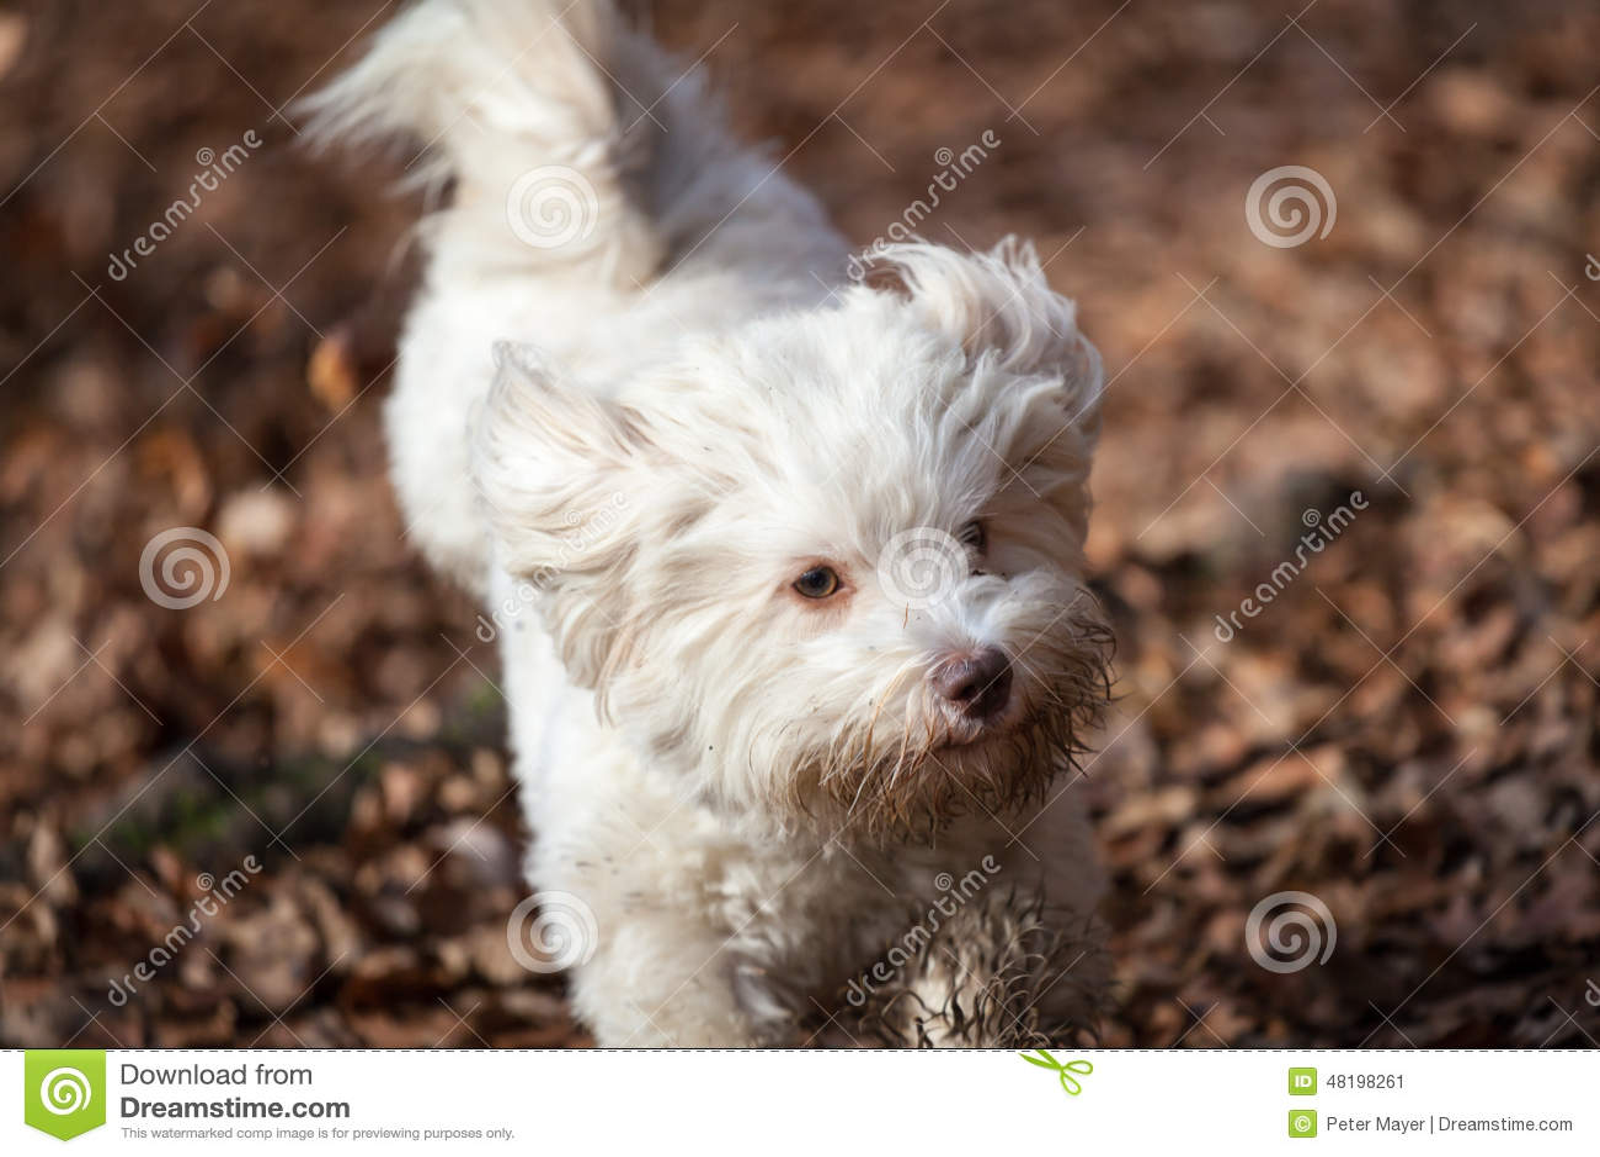 Havanese dog running